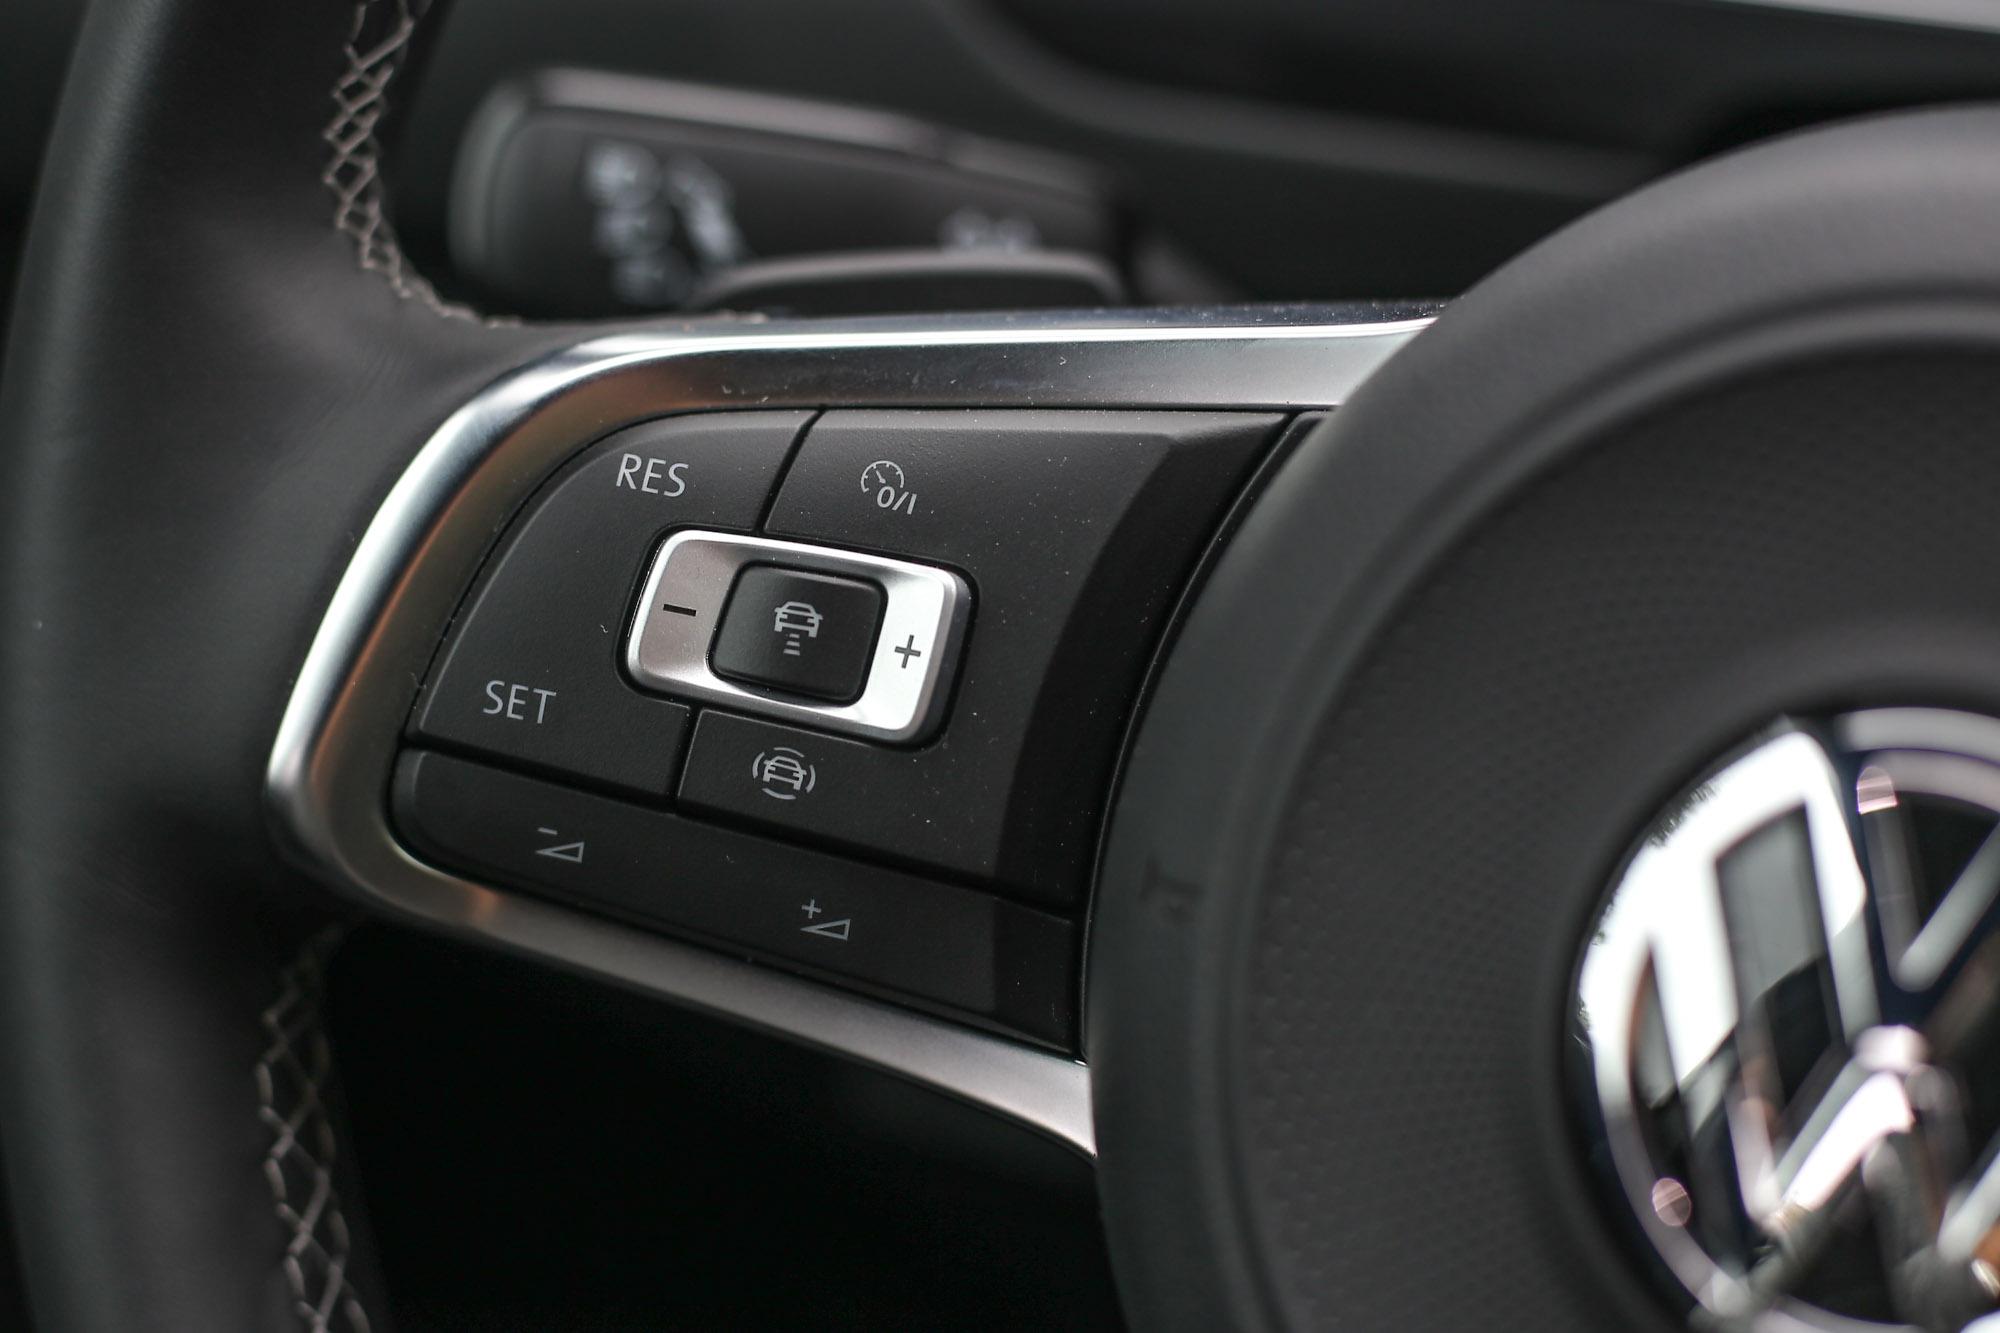 IQ.DRIVE主要的科技精華在於整合ACC主動式固定車距巡航系統與主動式車道修正輔助系統兩大功能,也可透過方向盤左方按鍵迅速輕鬆操作。